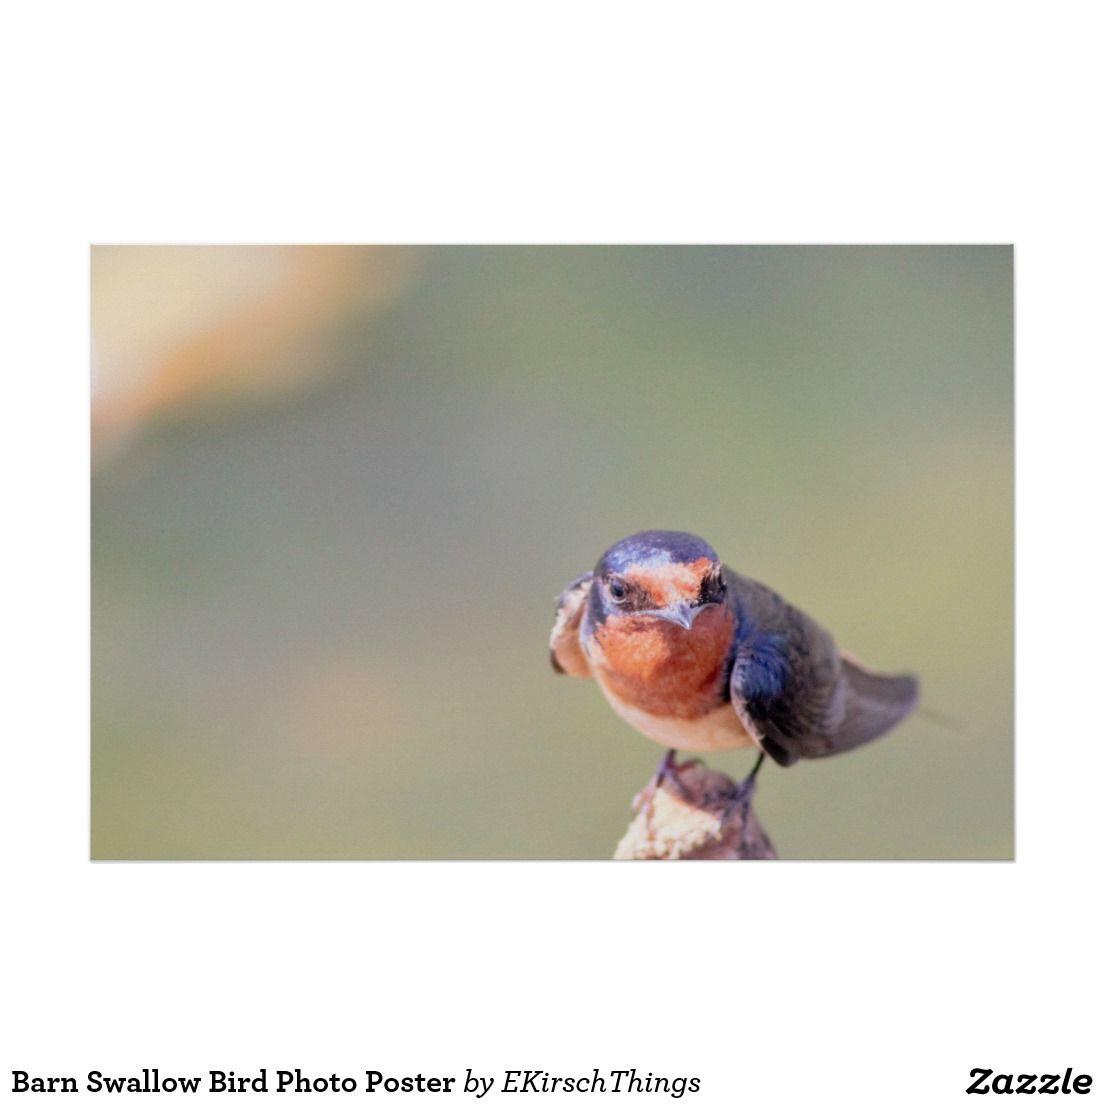 Barn Swallow Bird Photo Poster